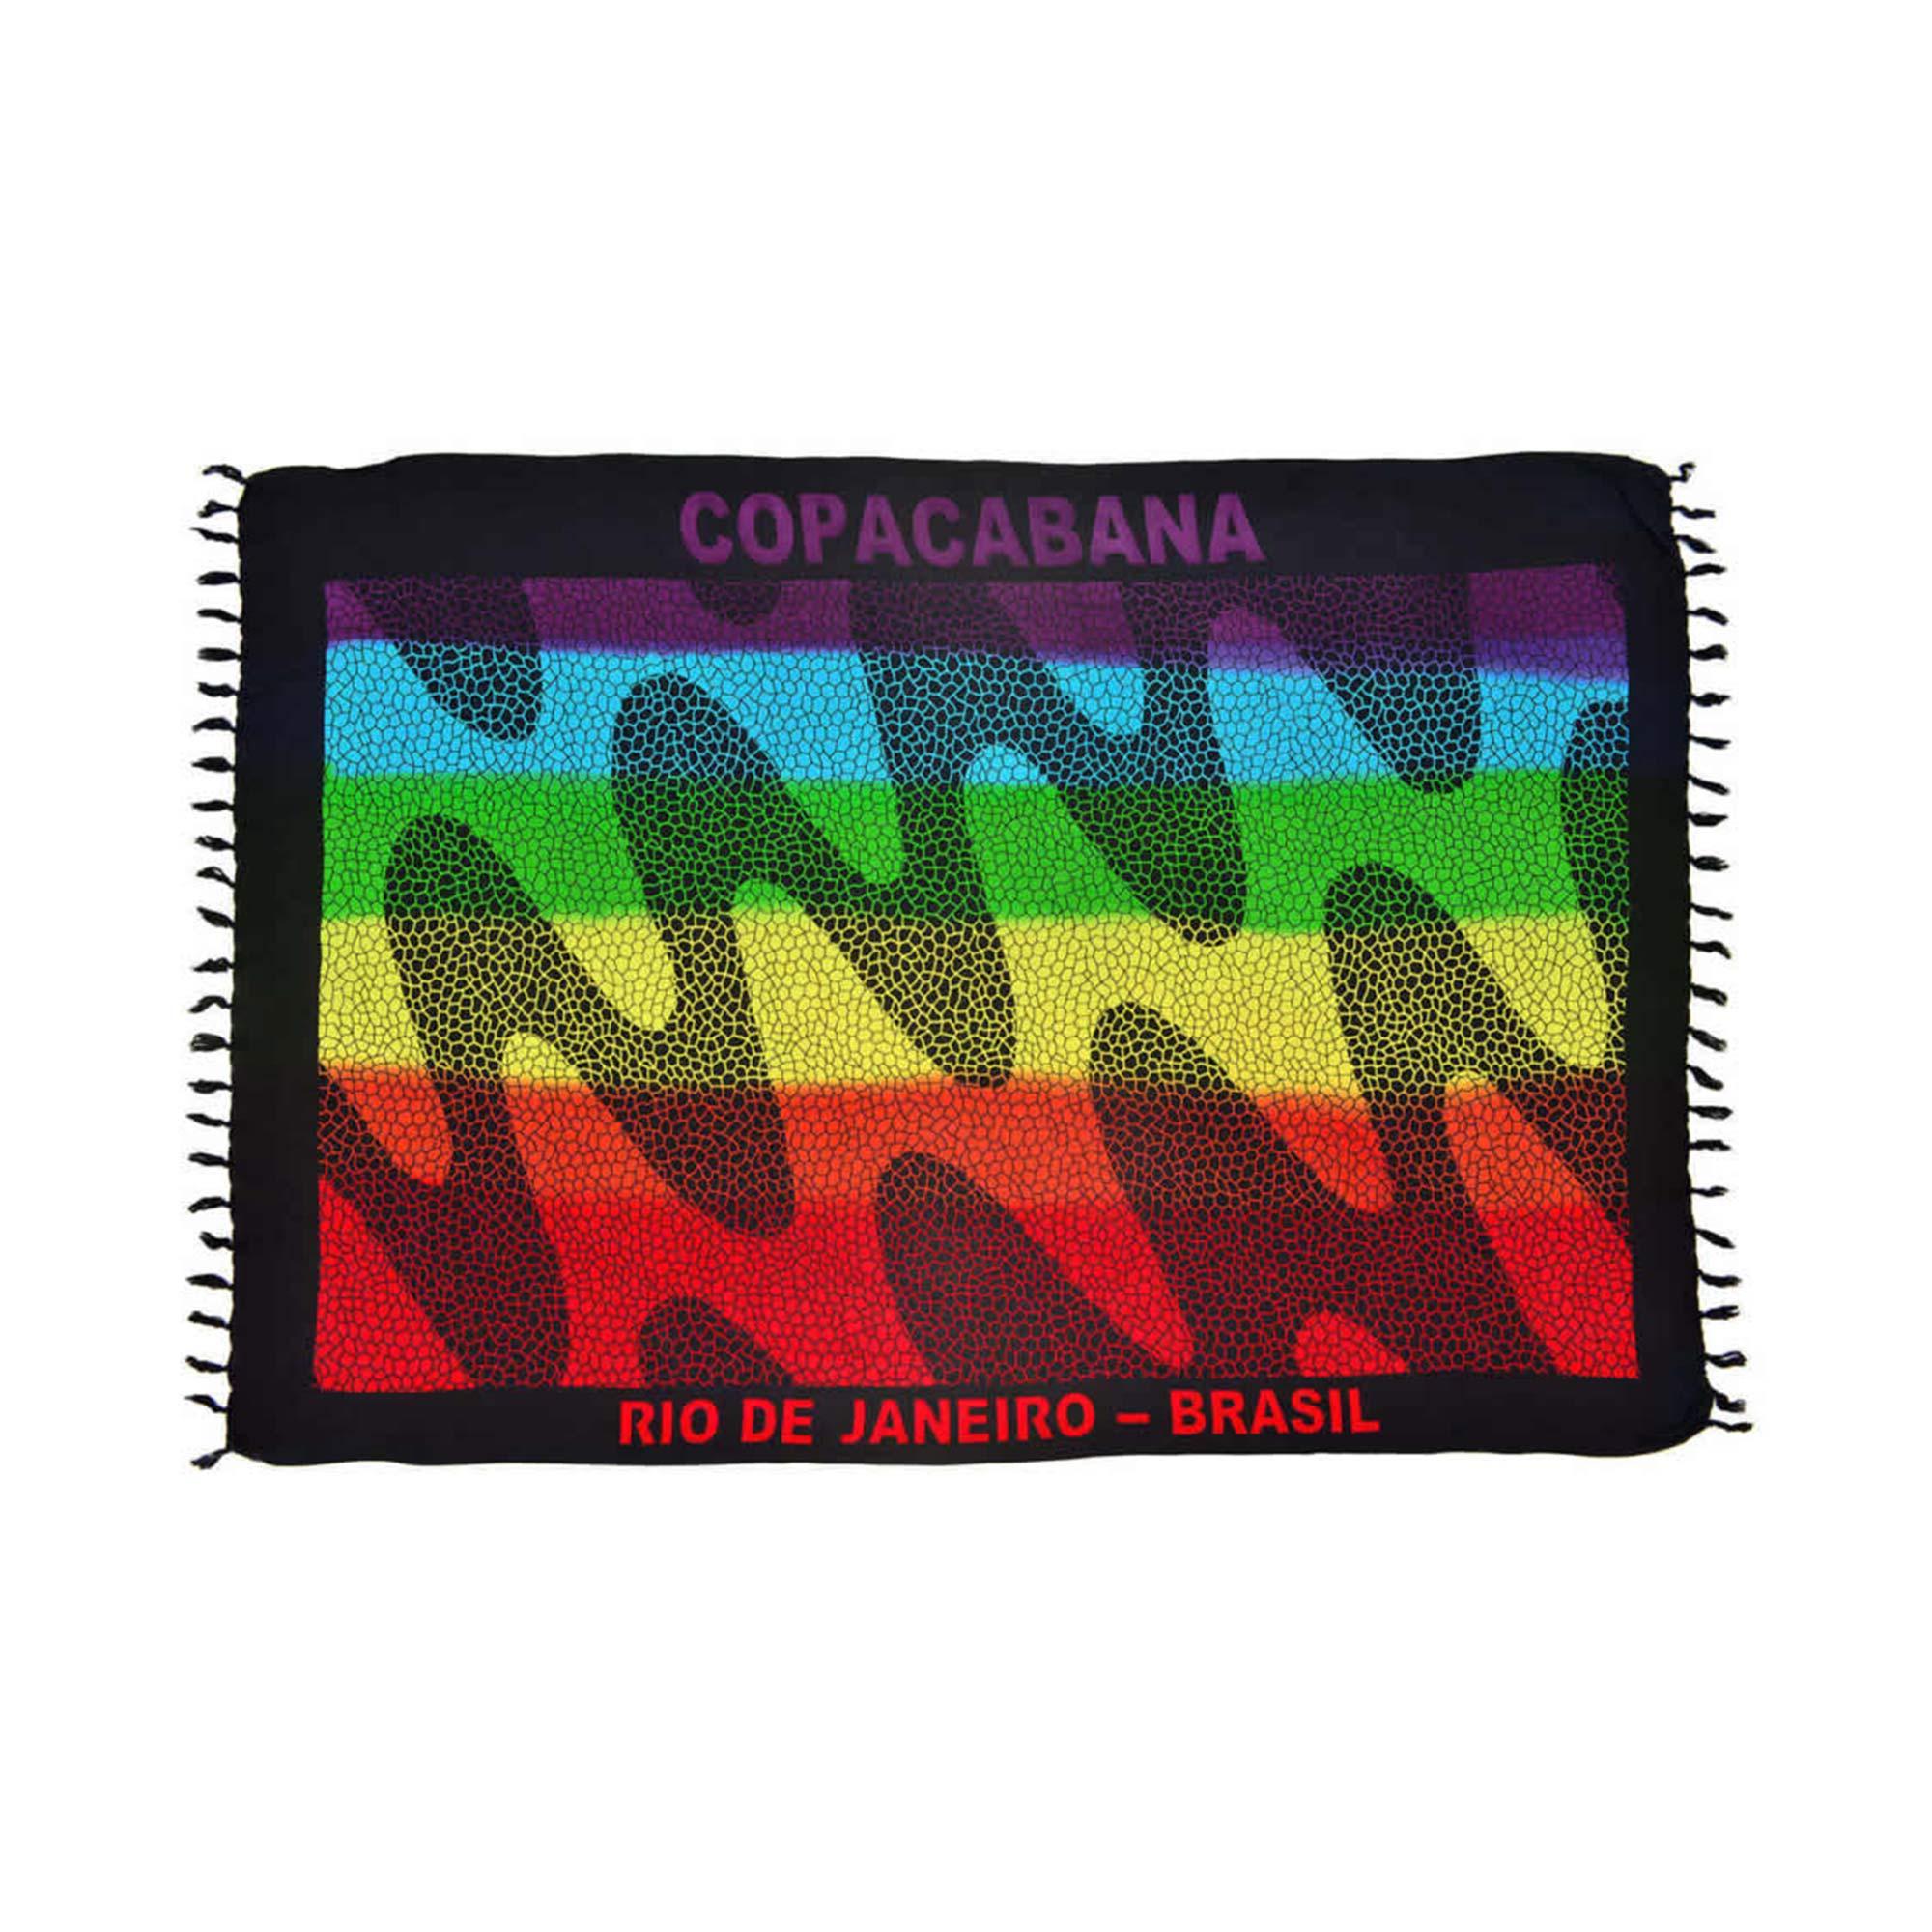 Canga Copacabana Rainbow